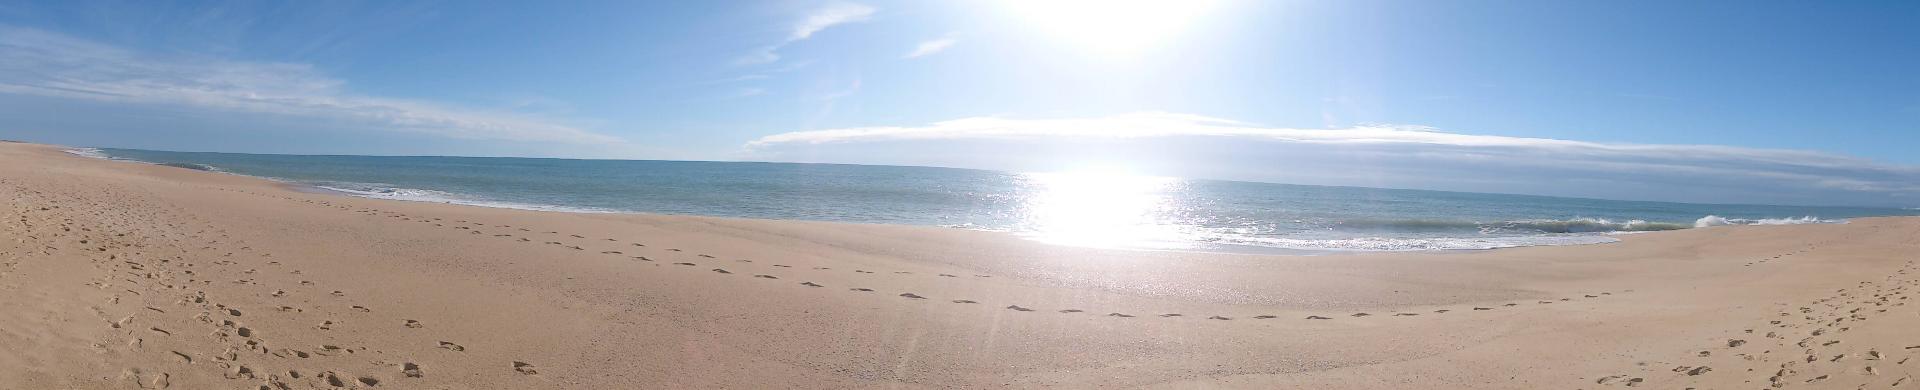 Faro's Beach